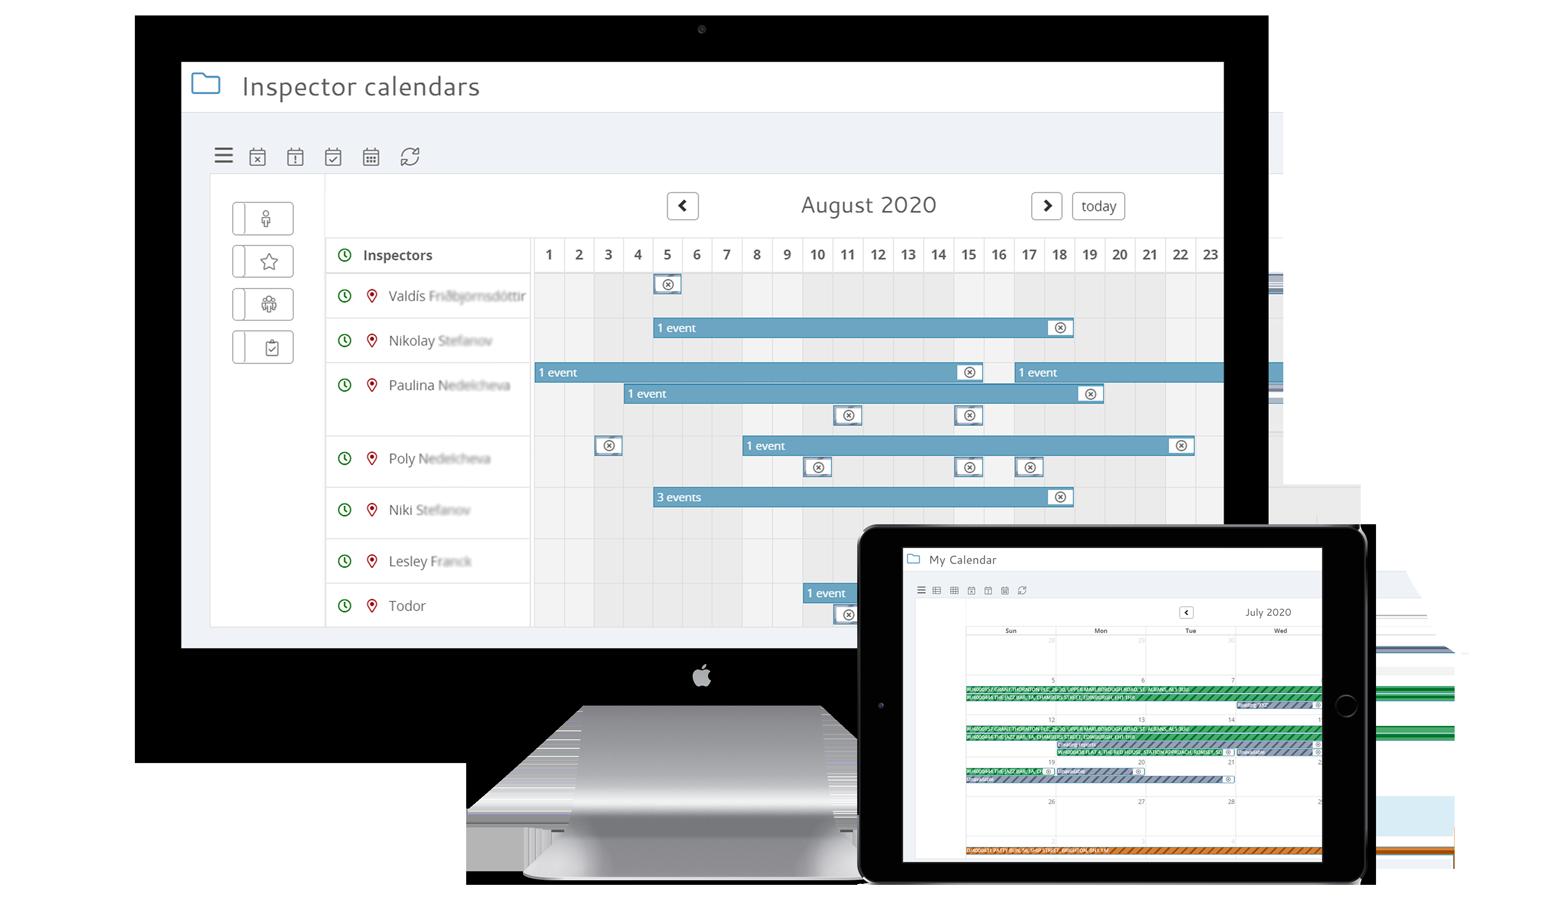 Canalix inspector calendars